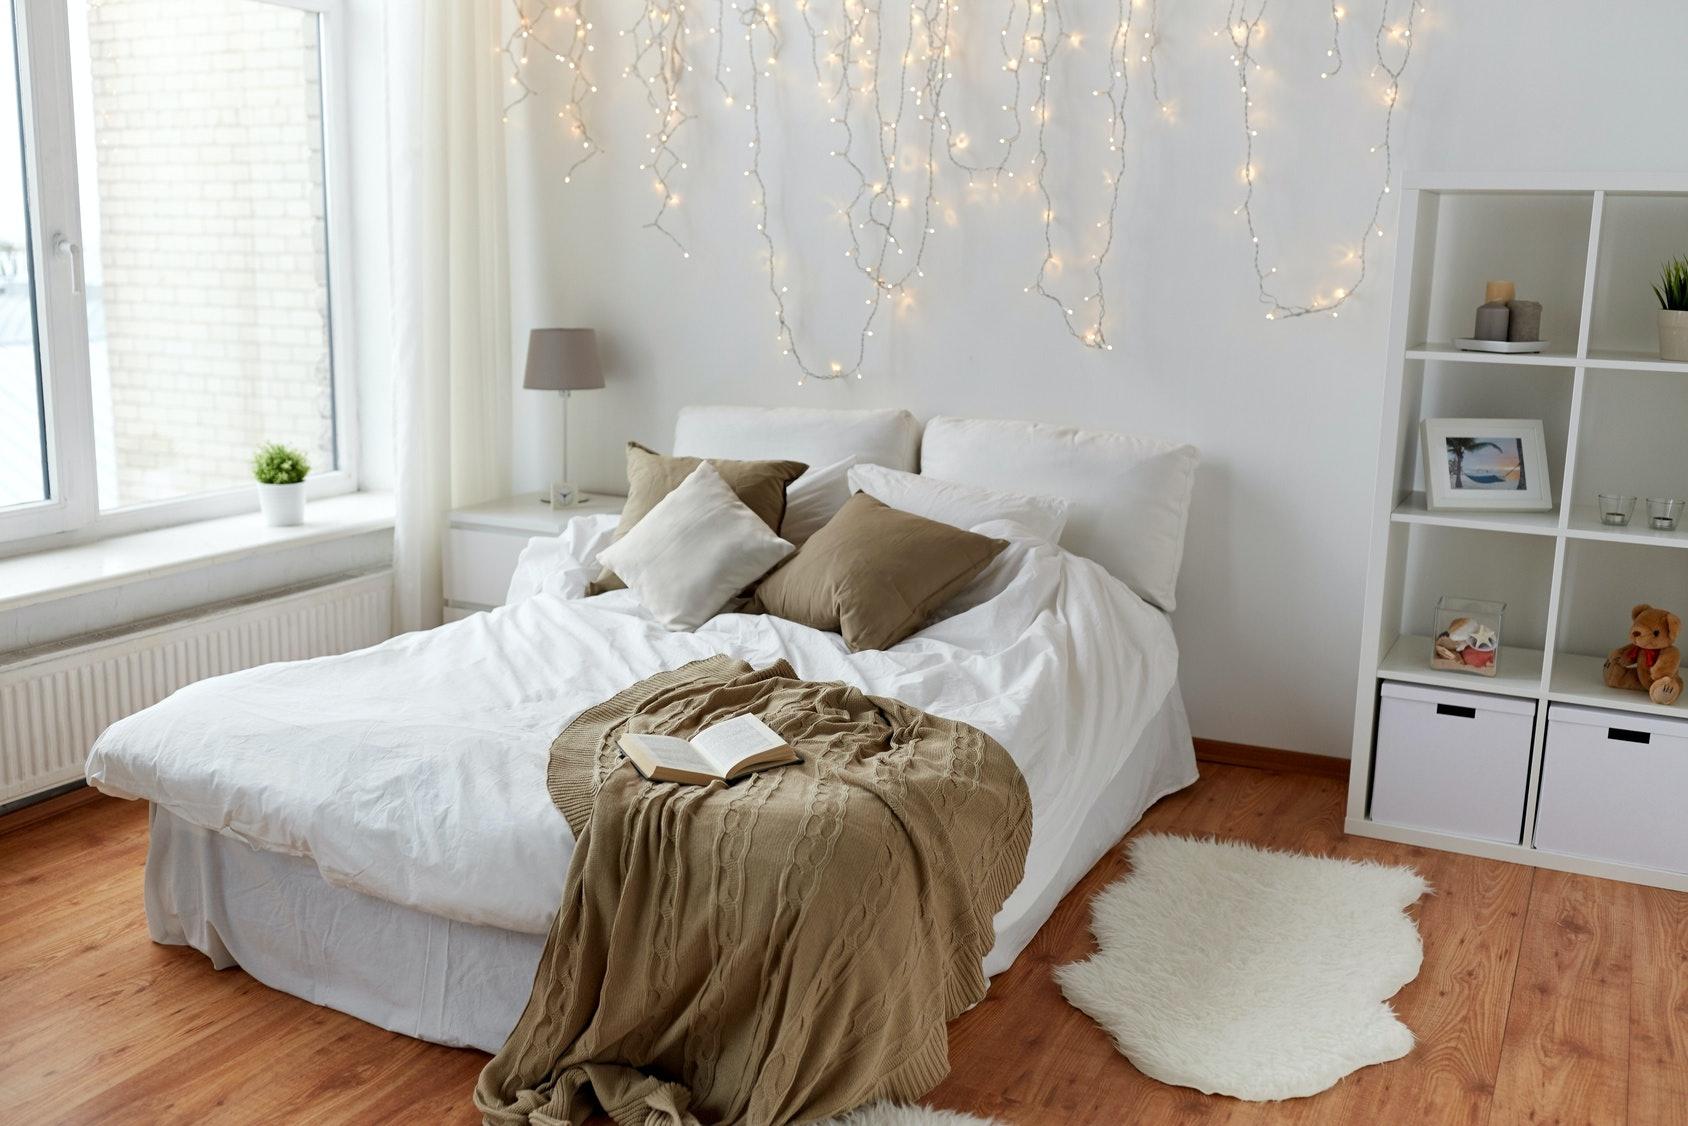 11 Hacks To Make Your Bedroom